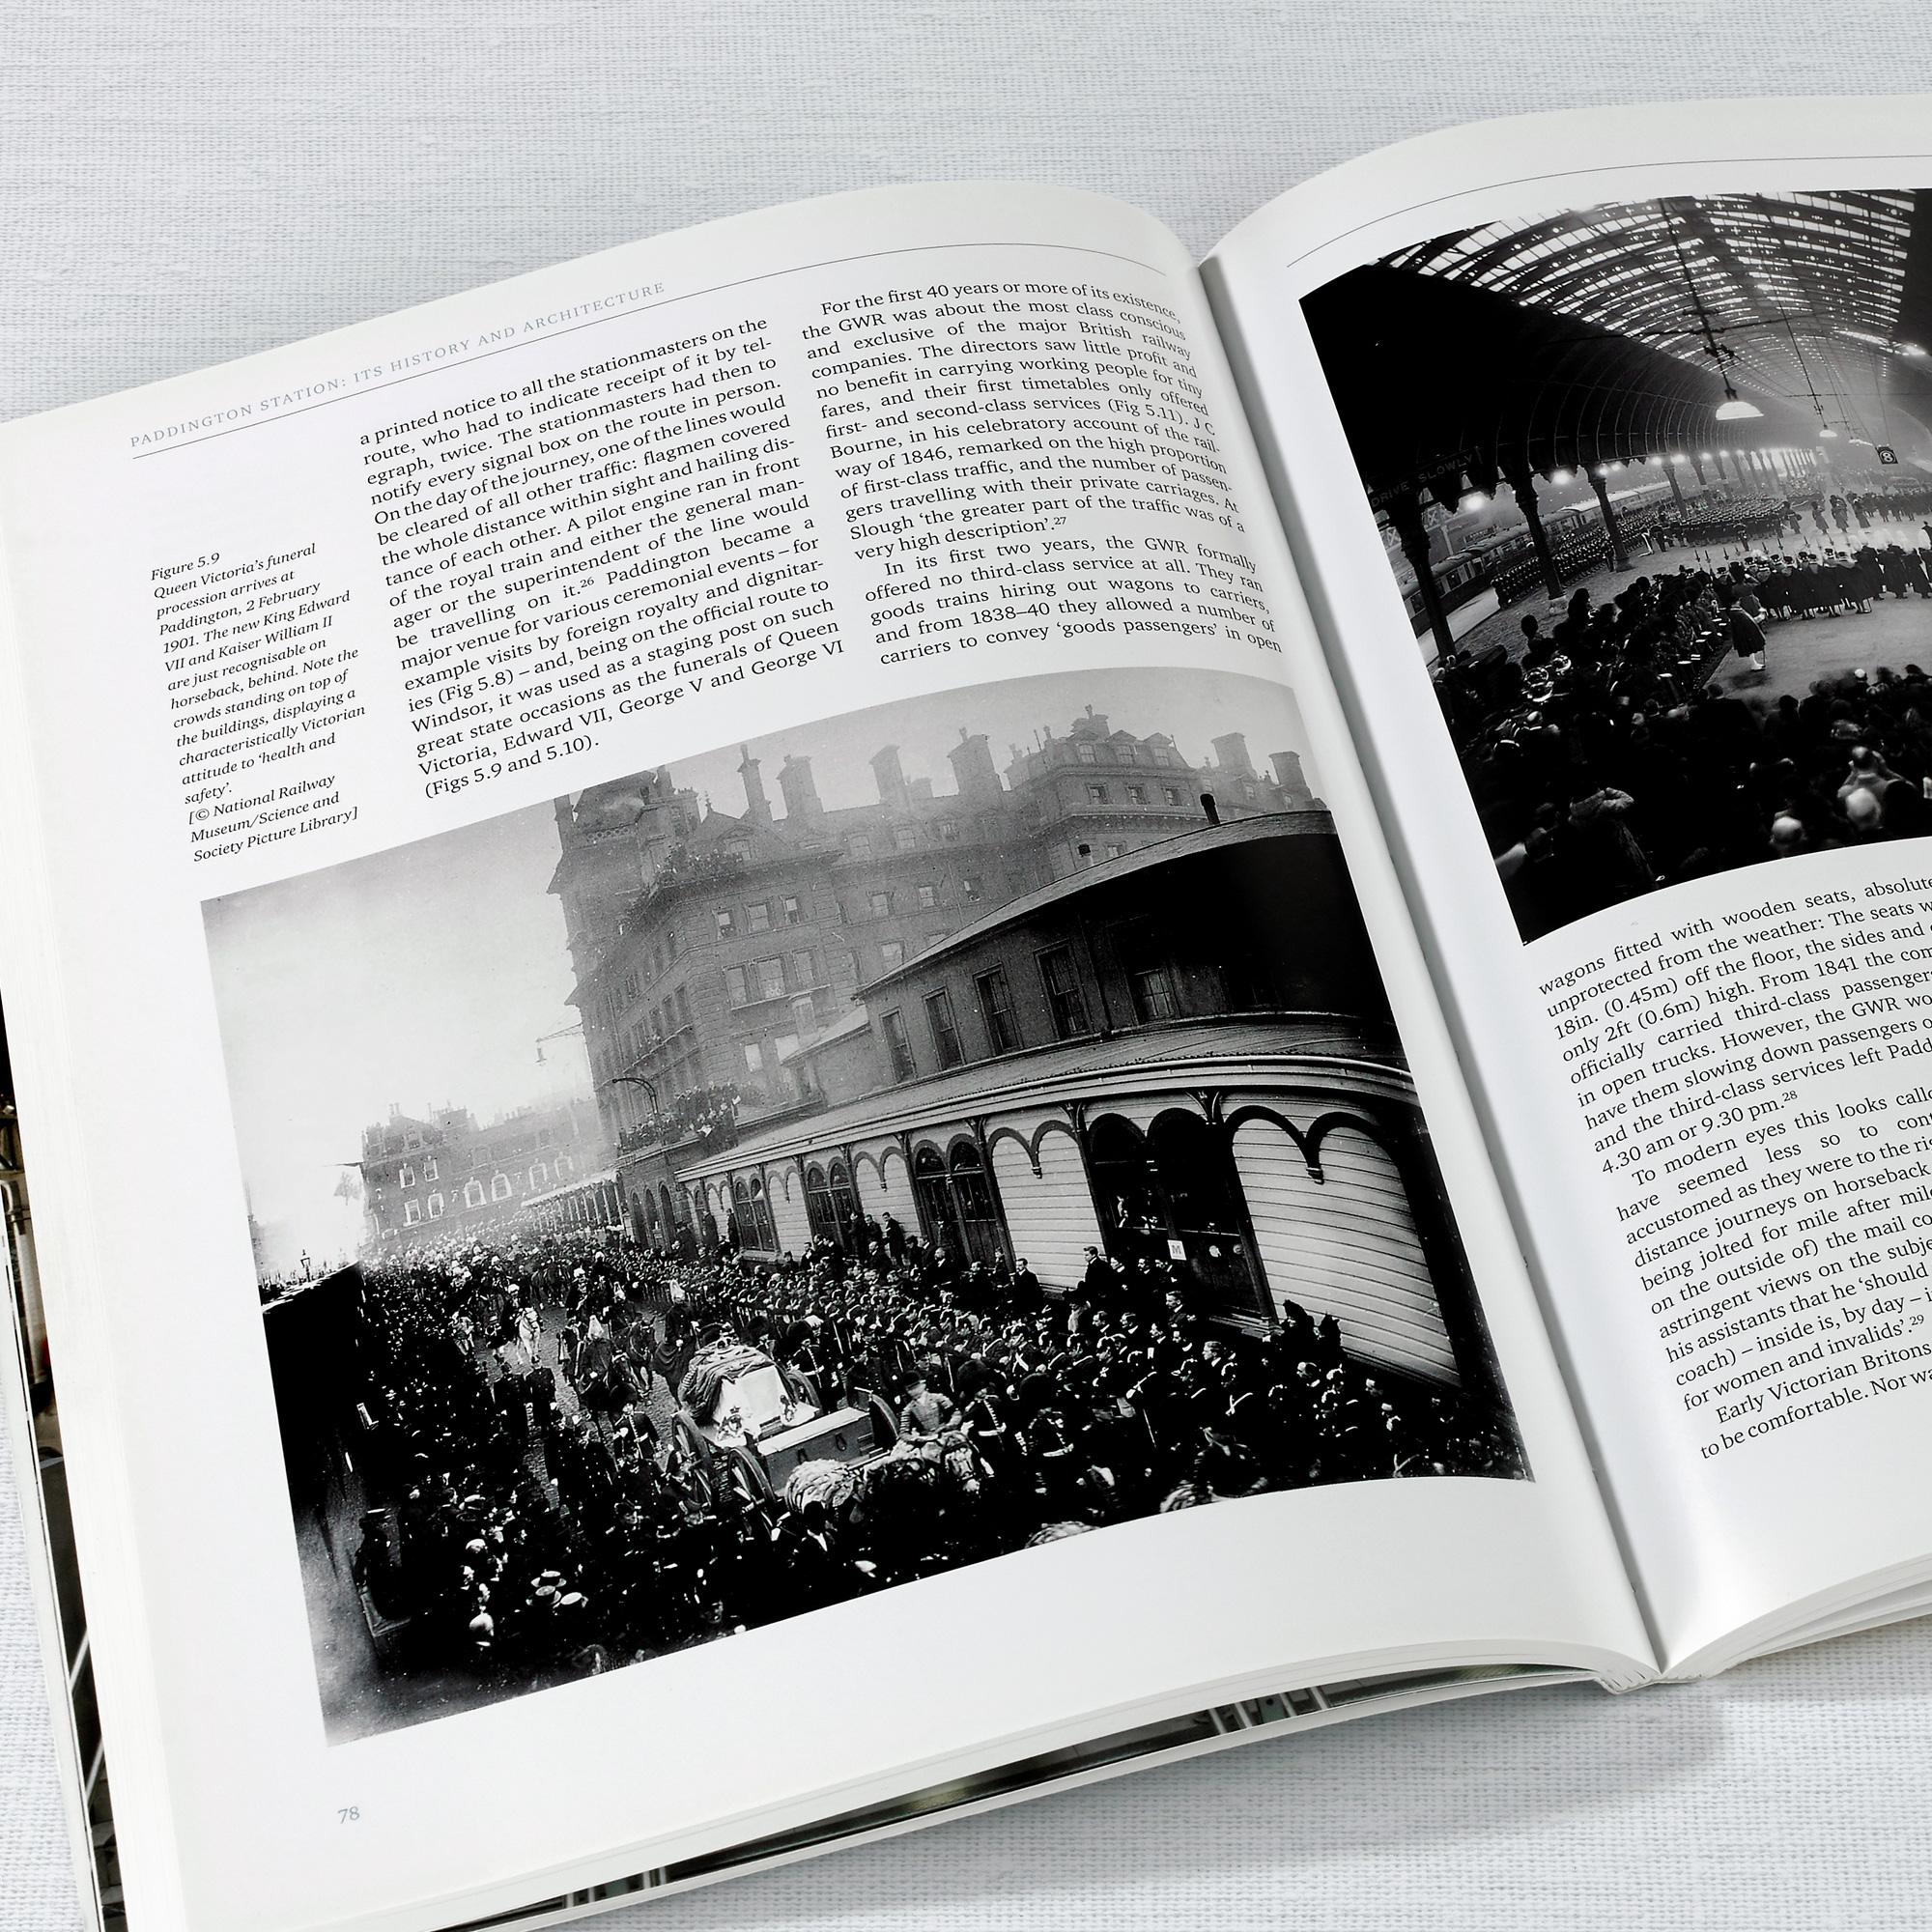 Paddington Station, English Heritage Book